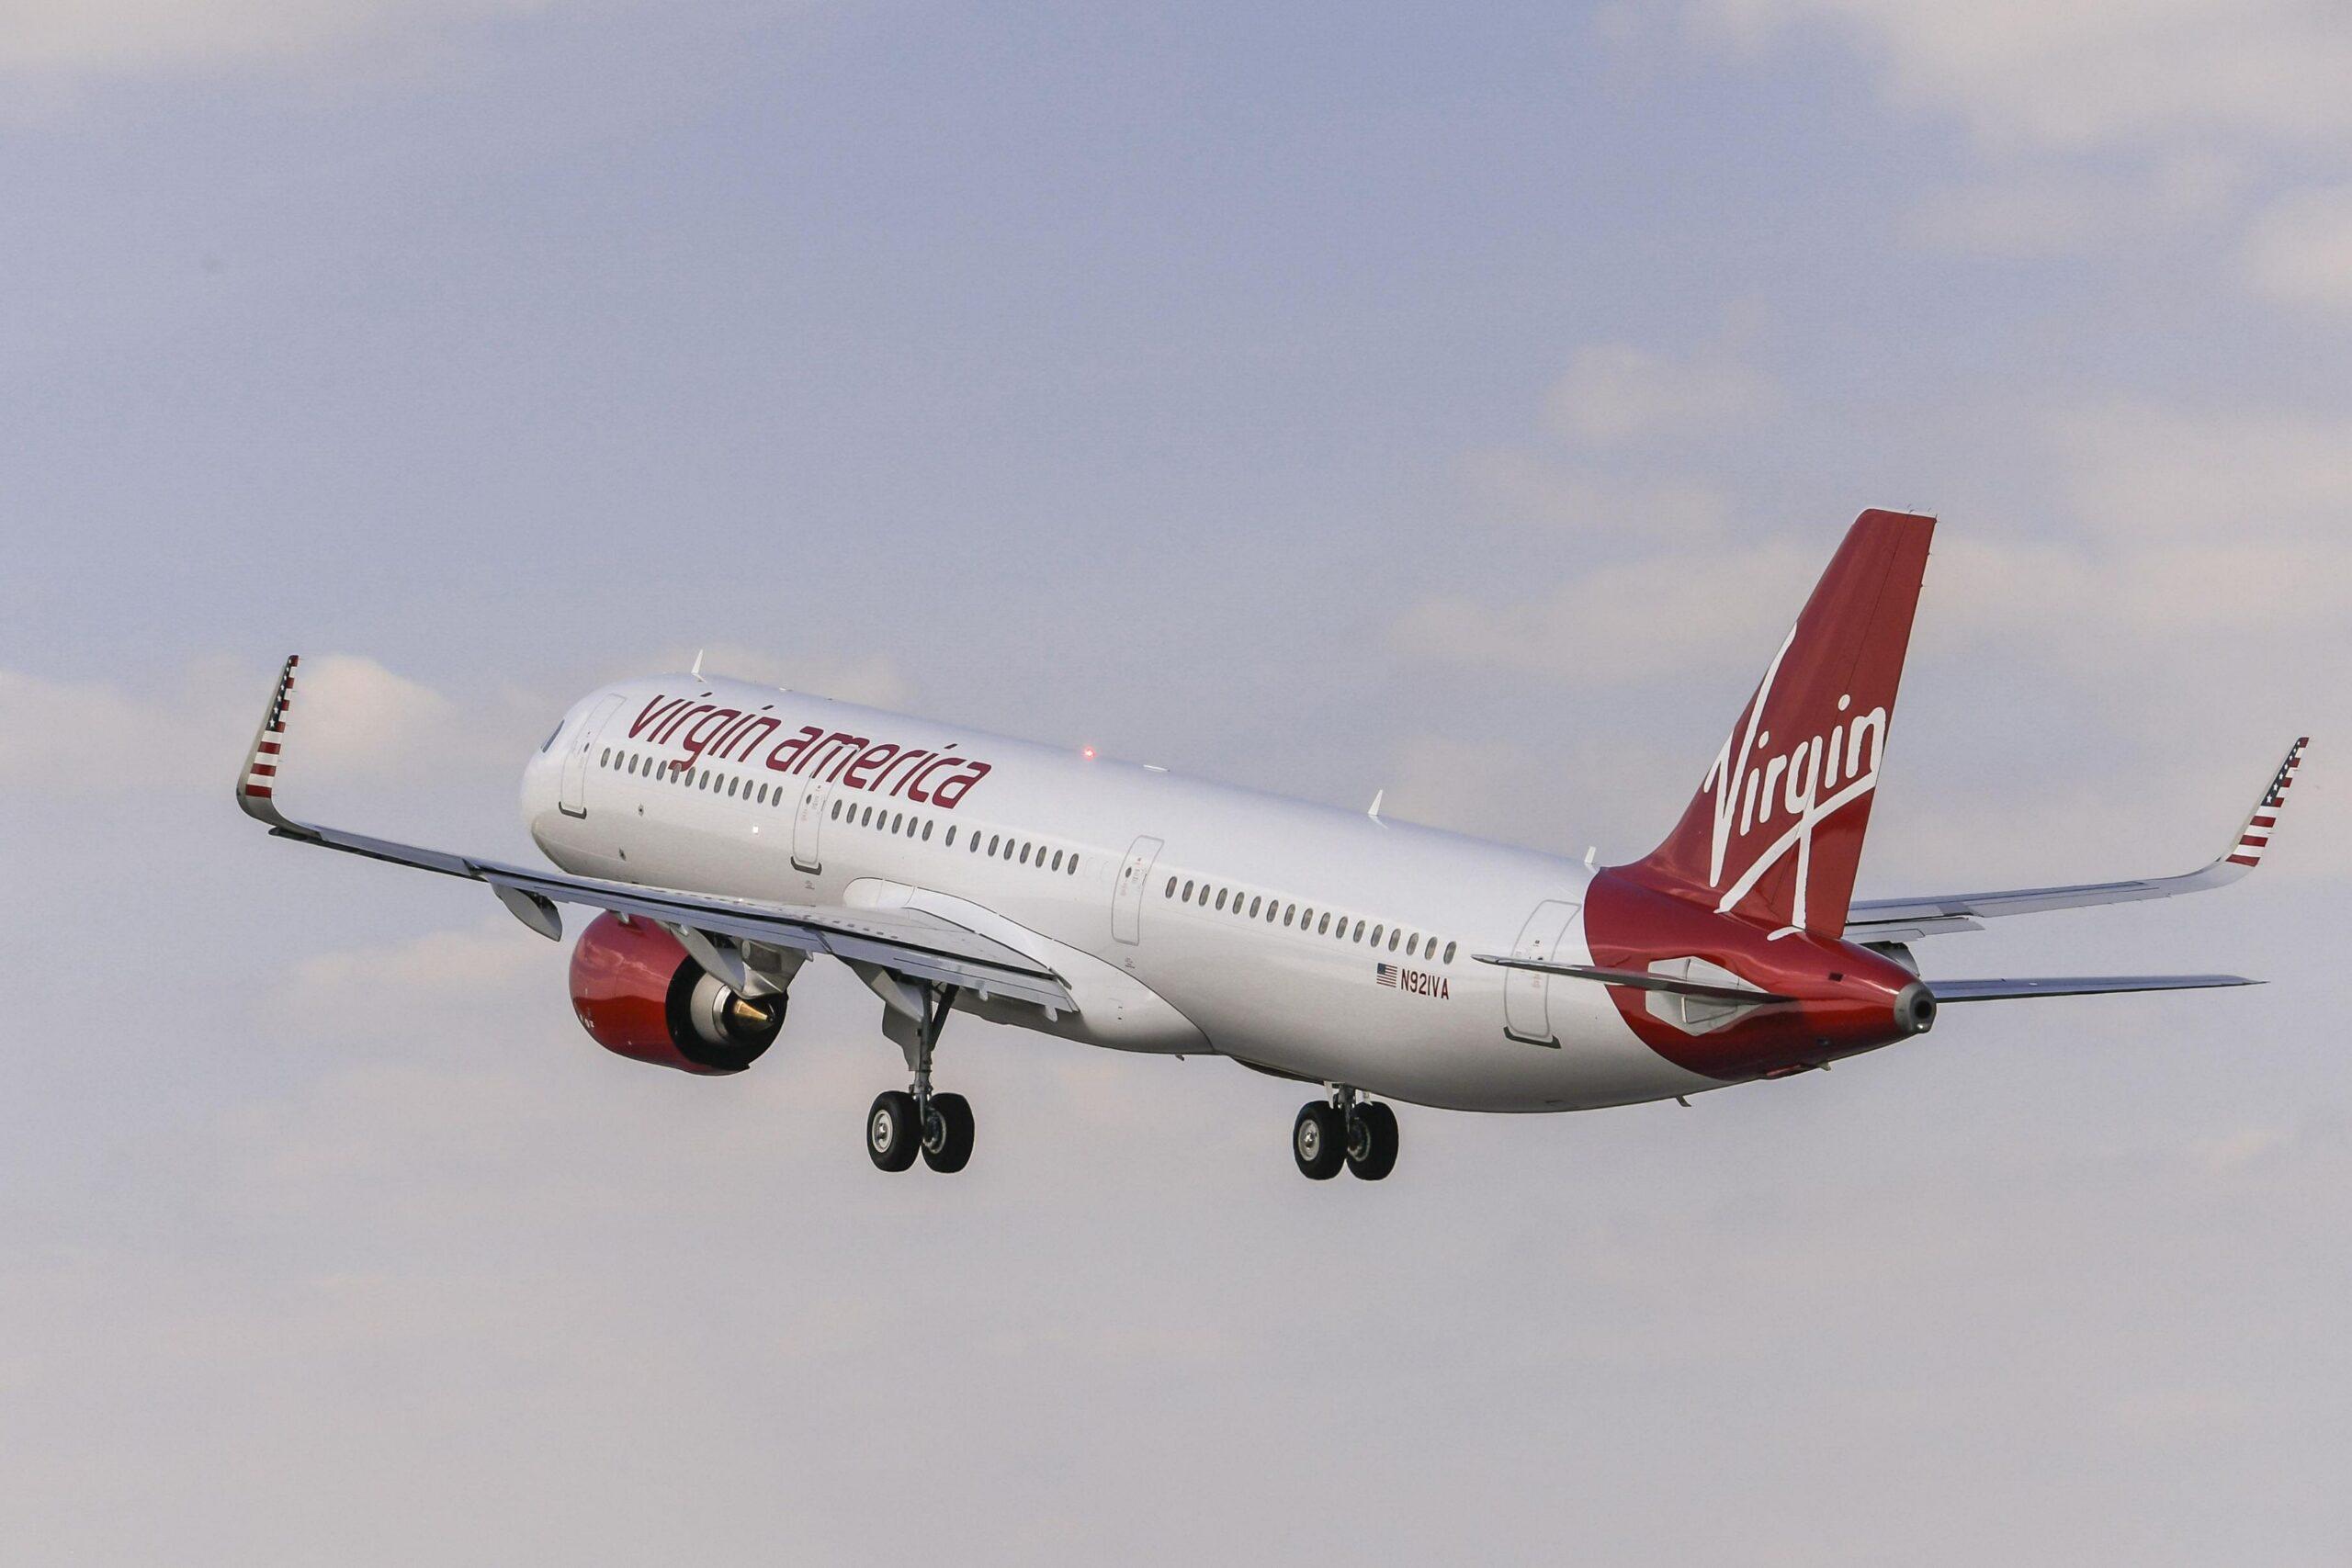 Why Didn't JetBlue Buy Virgin America?